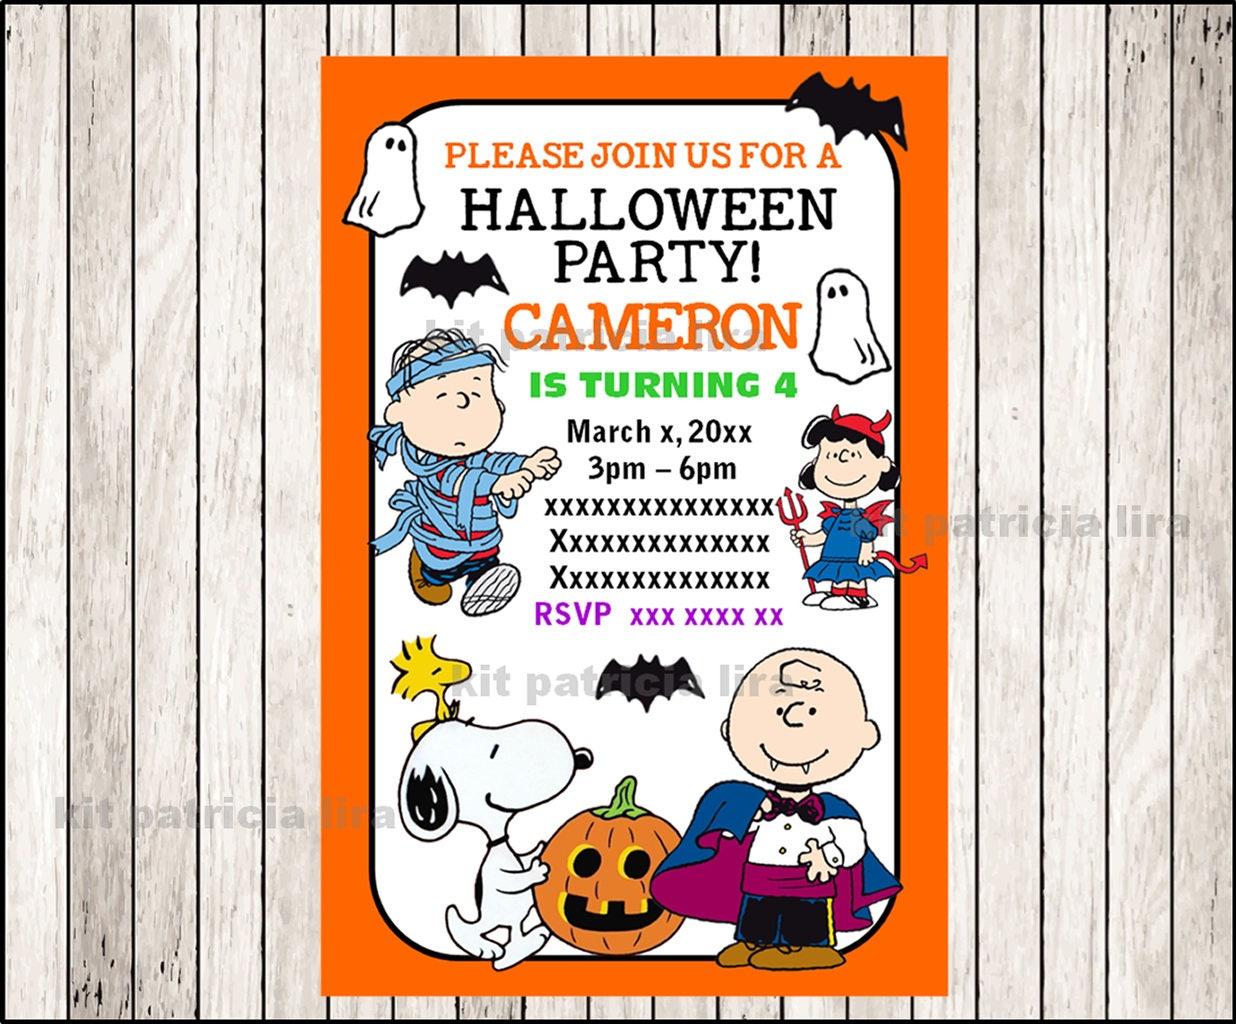 Peanuts Halloween Invitation Printable Charlie Brown party | Etsy